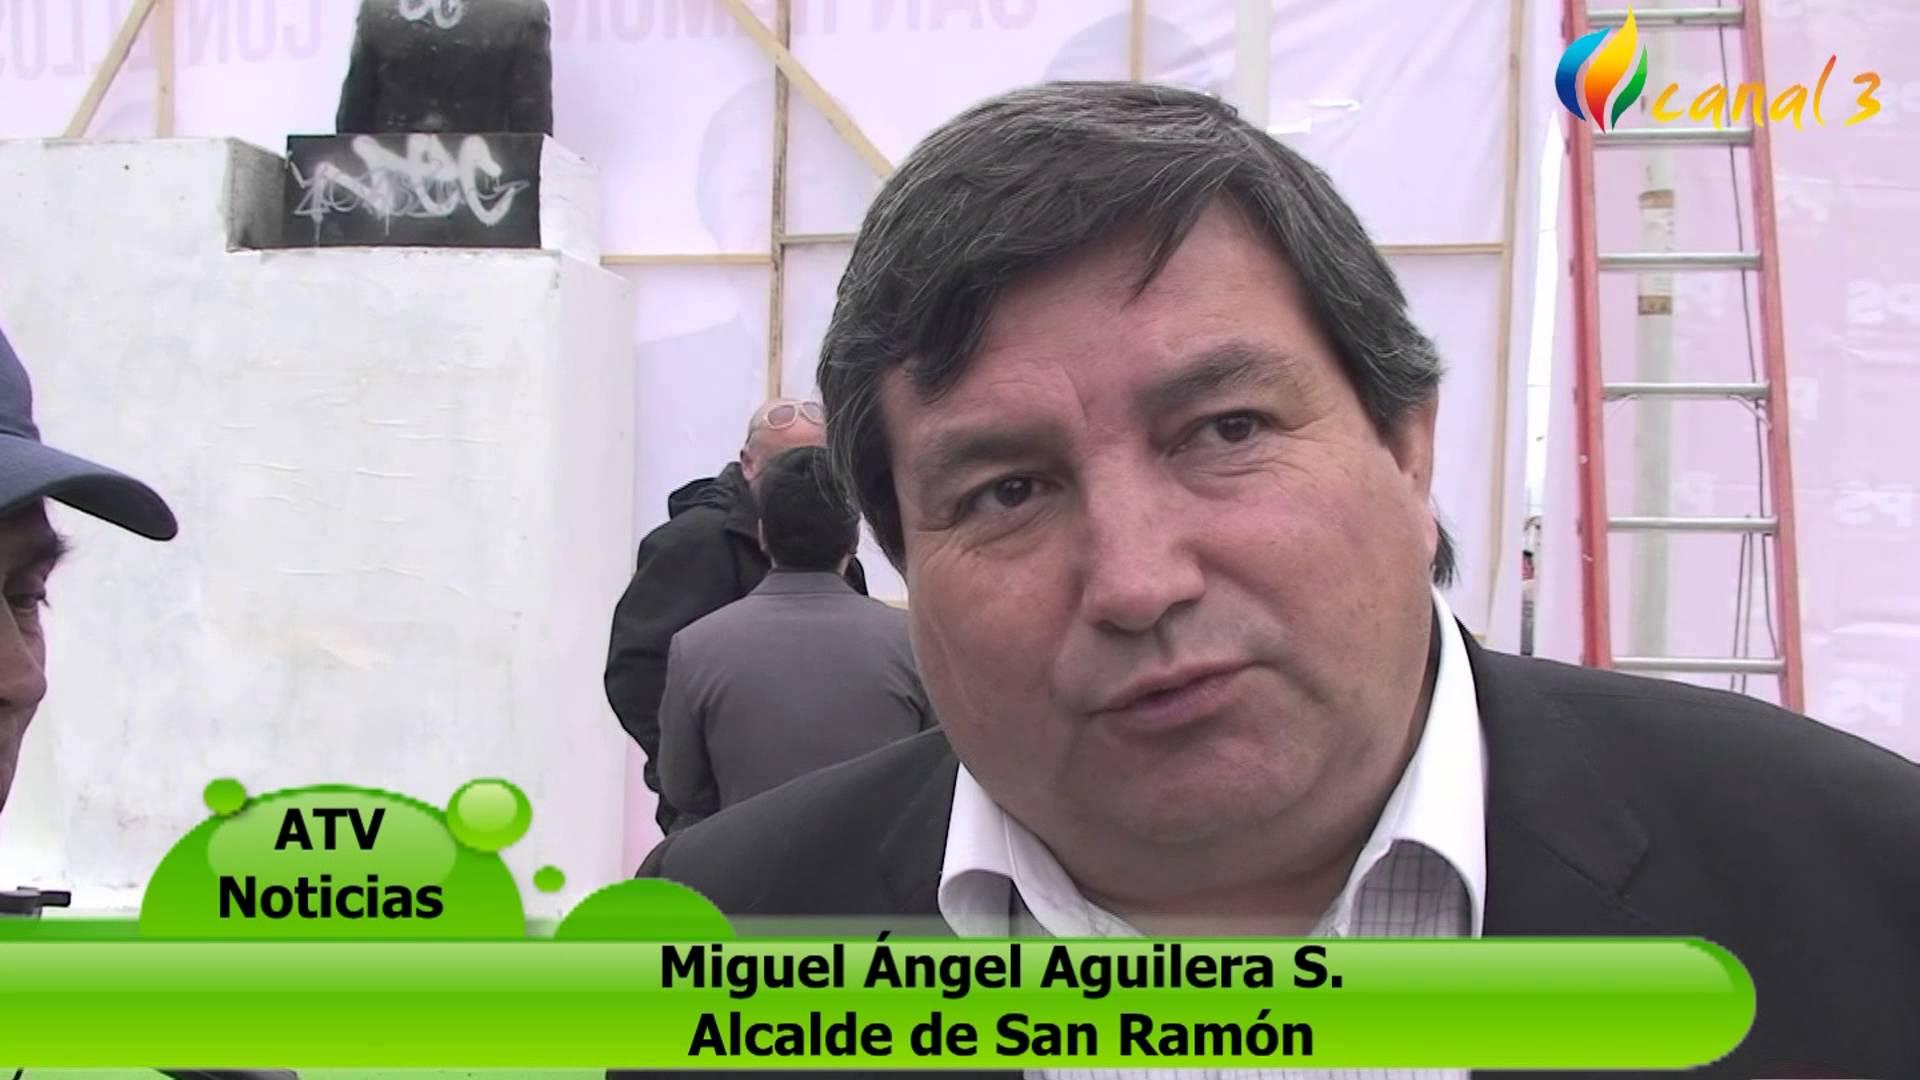 narco alcalde ps miguel angel aguilera 1